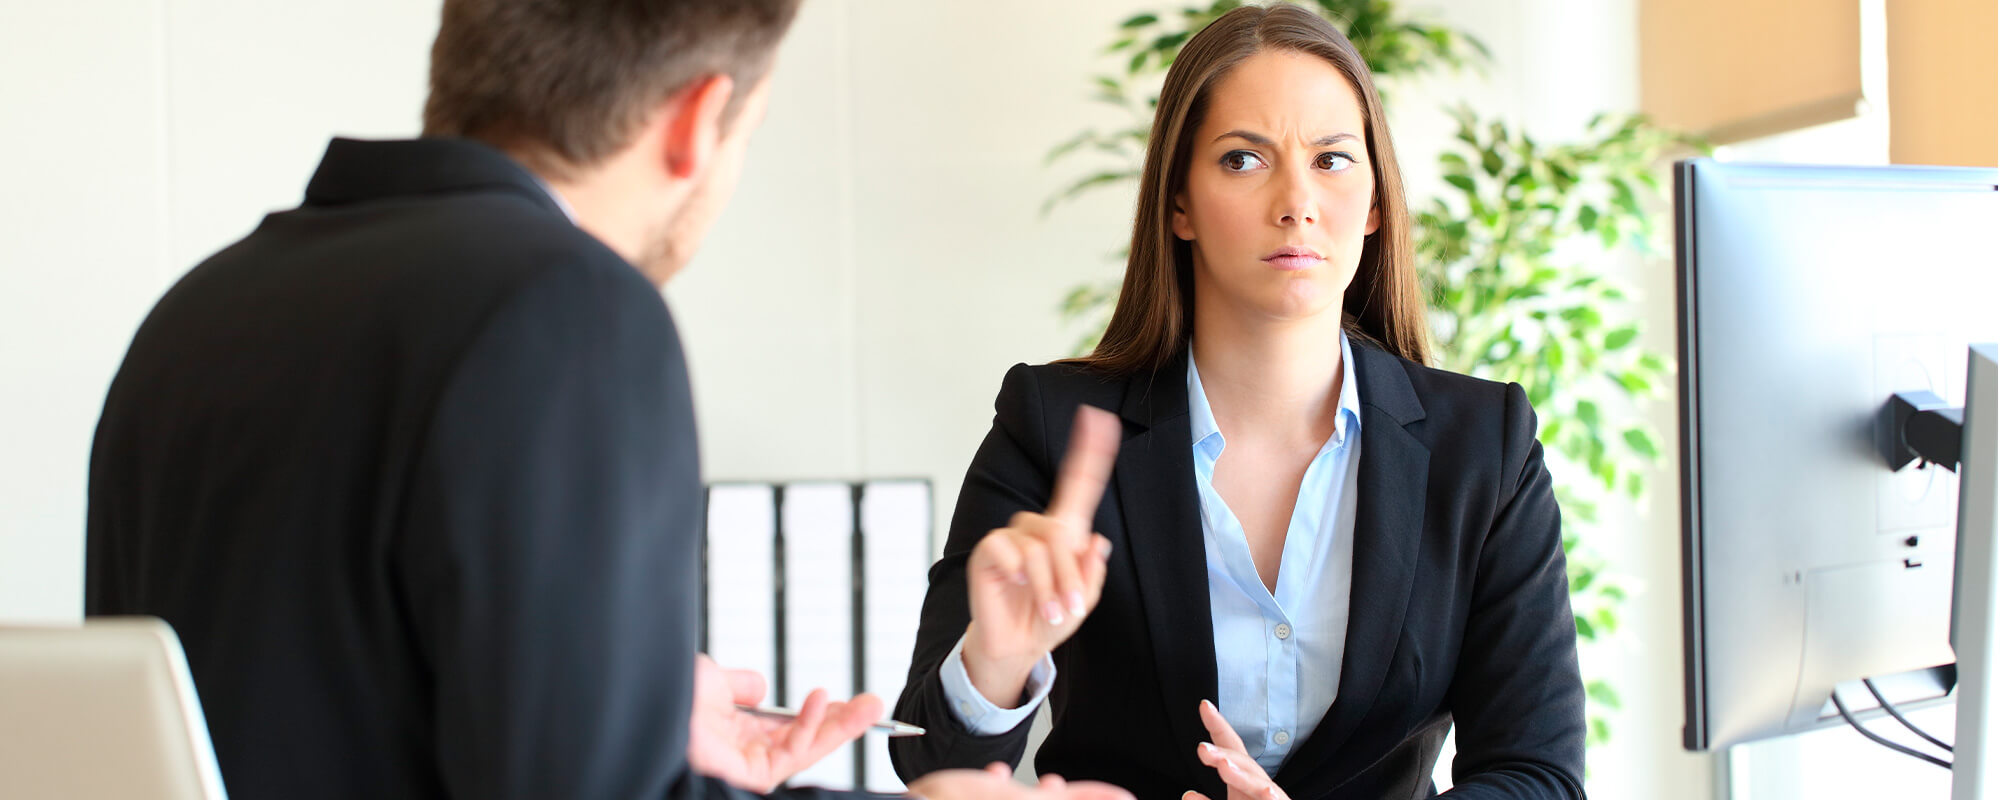 Tus Compañeros De Trabajo Son Tóxicos Aprende A Lidiar Con